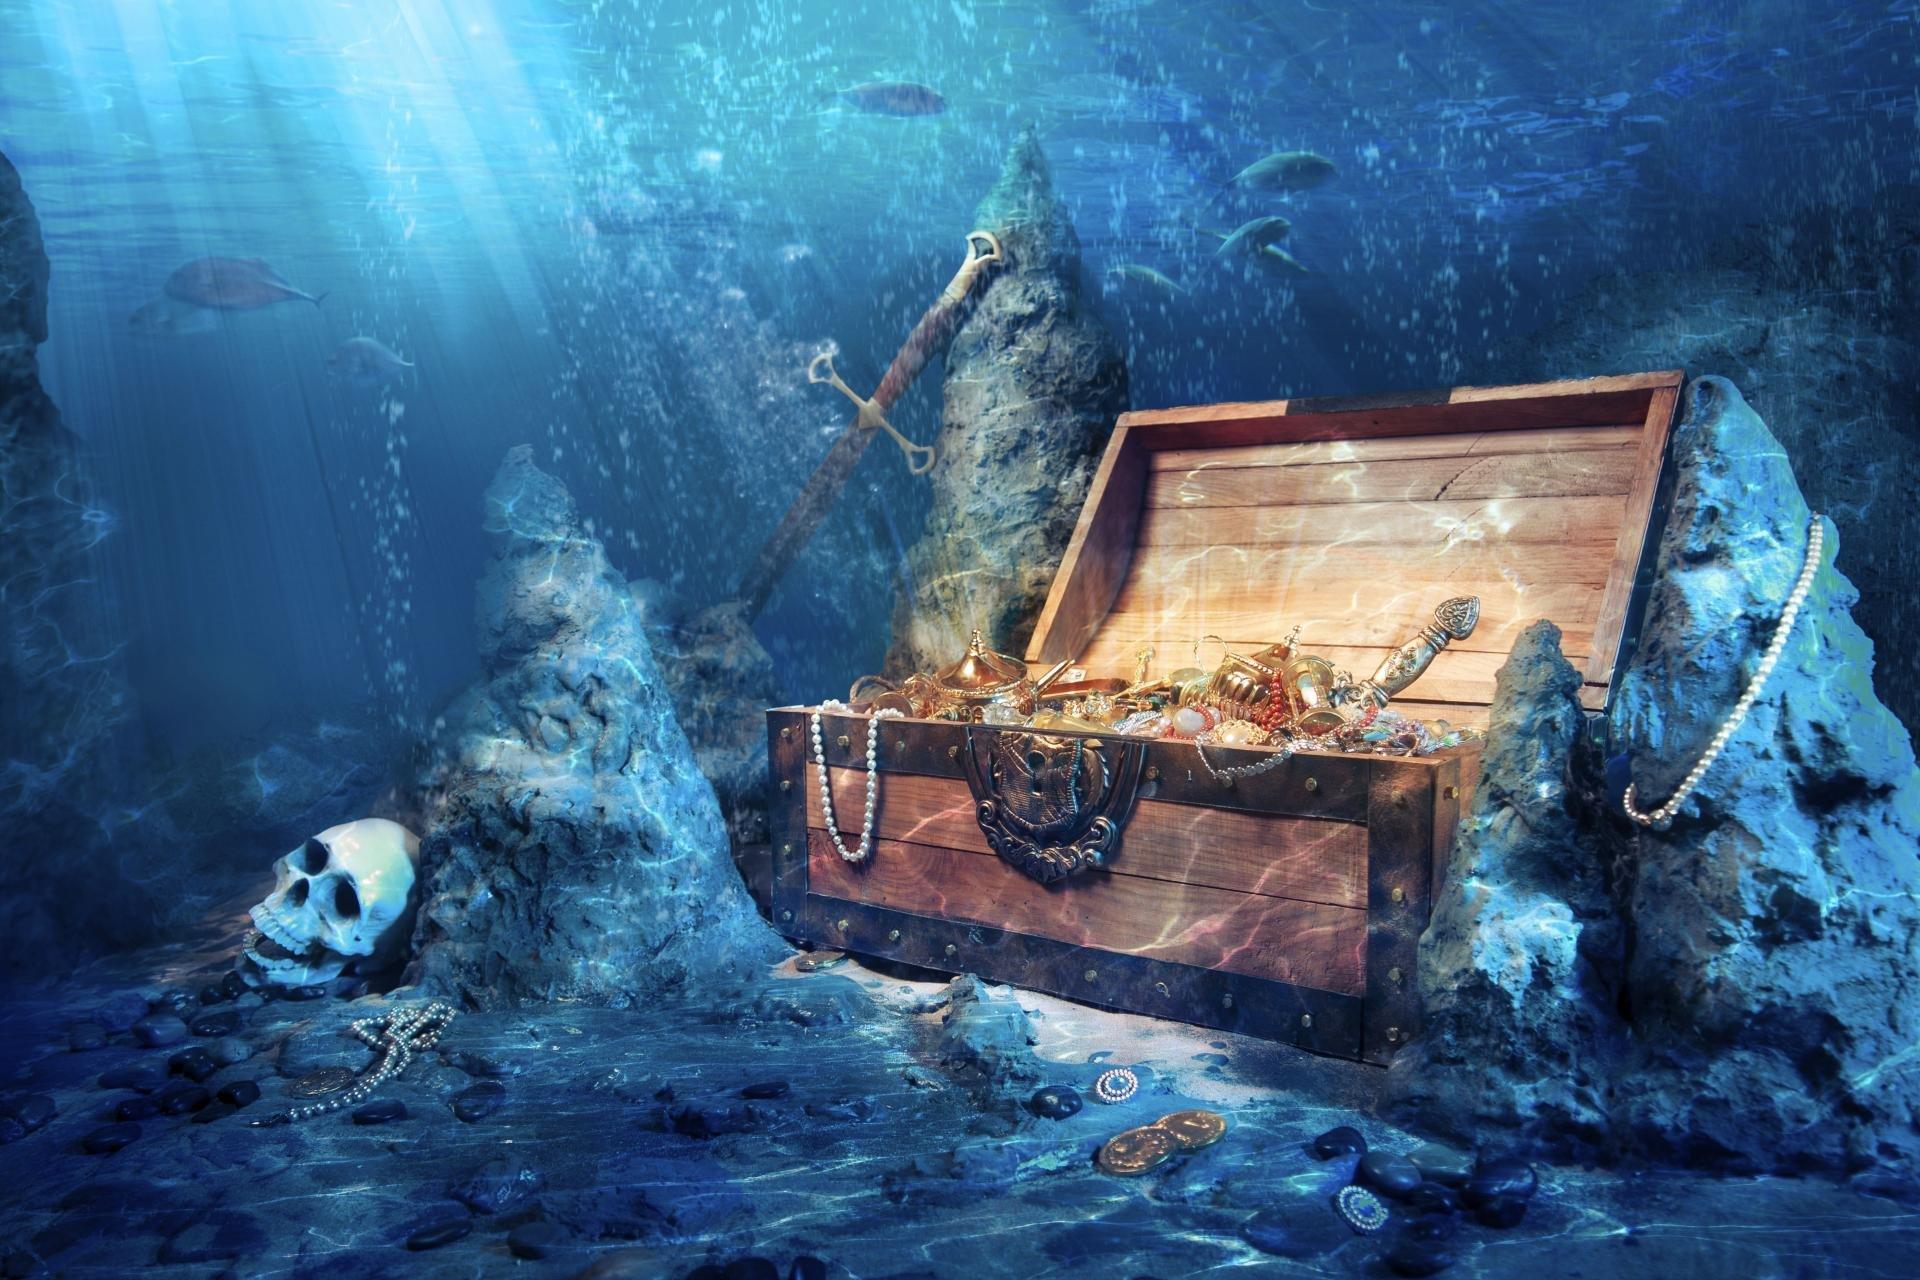 download hd 1920x1280 fantasy ocean computer background id:306130